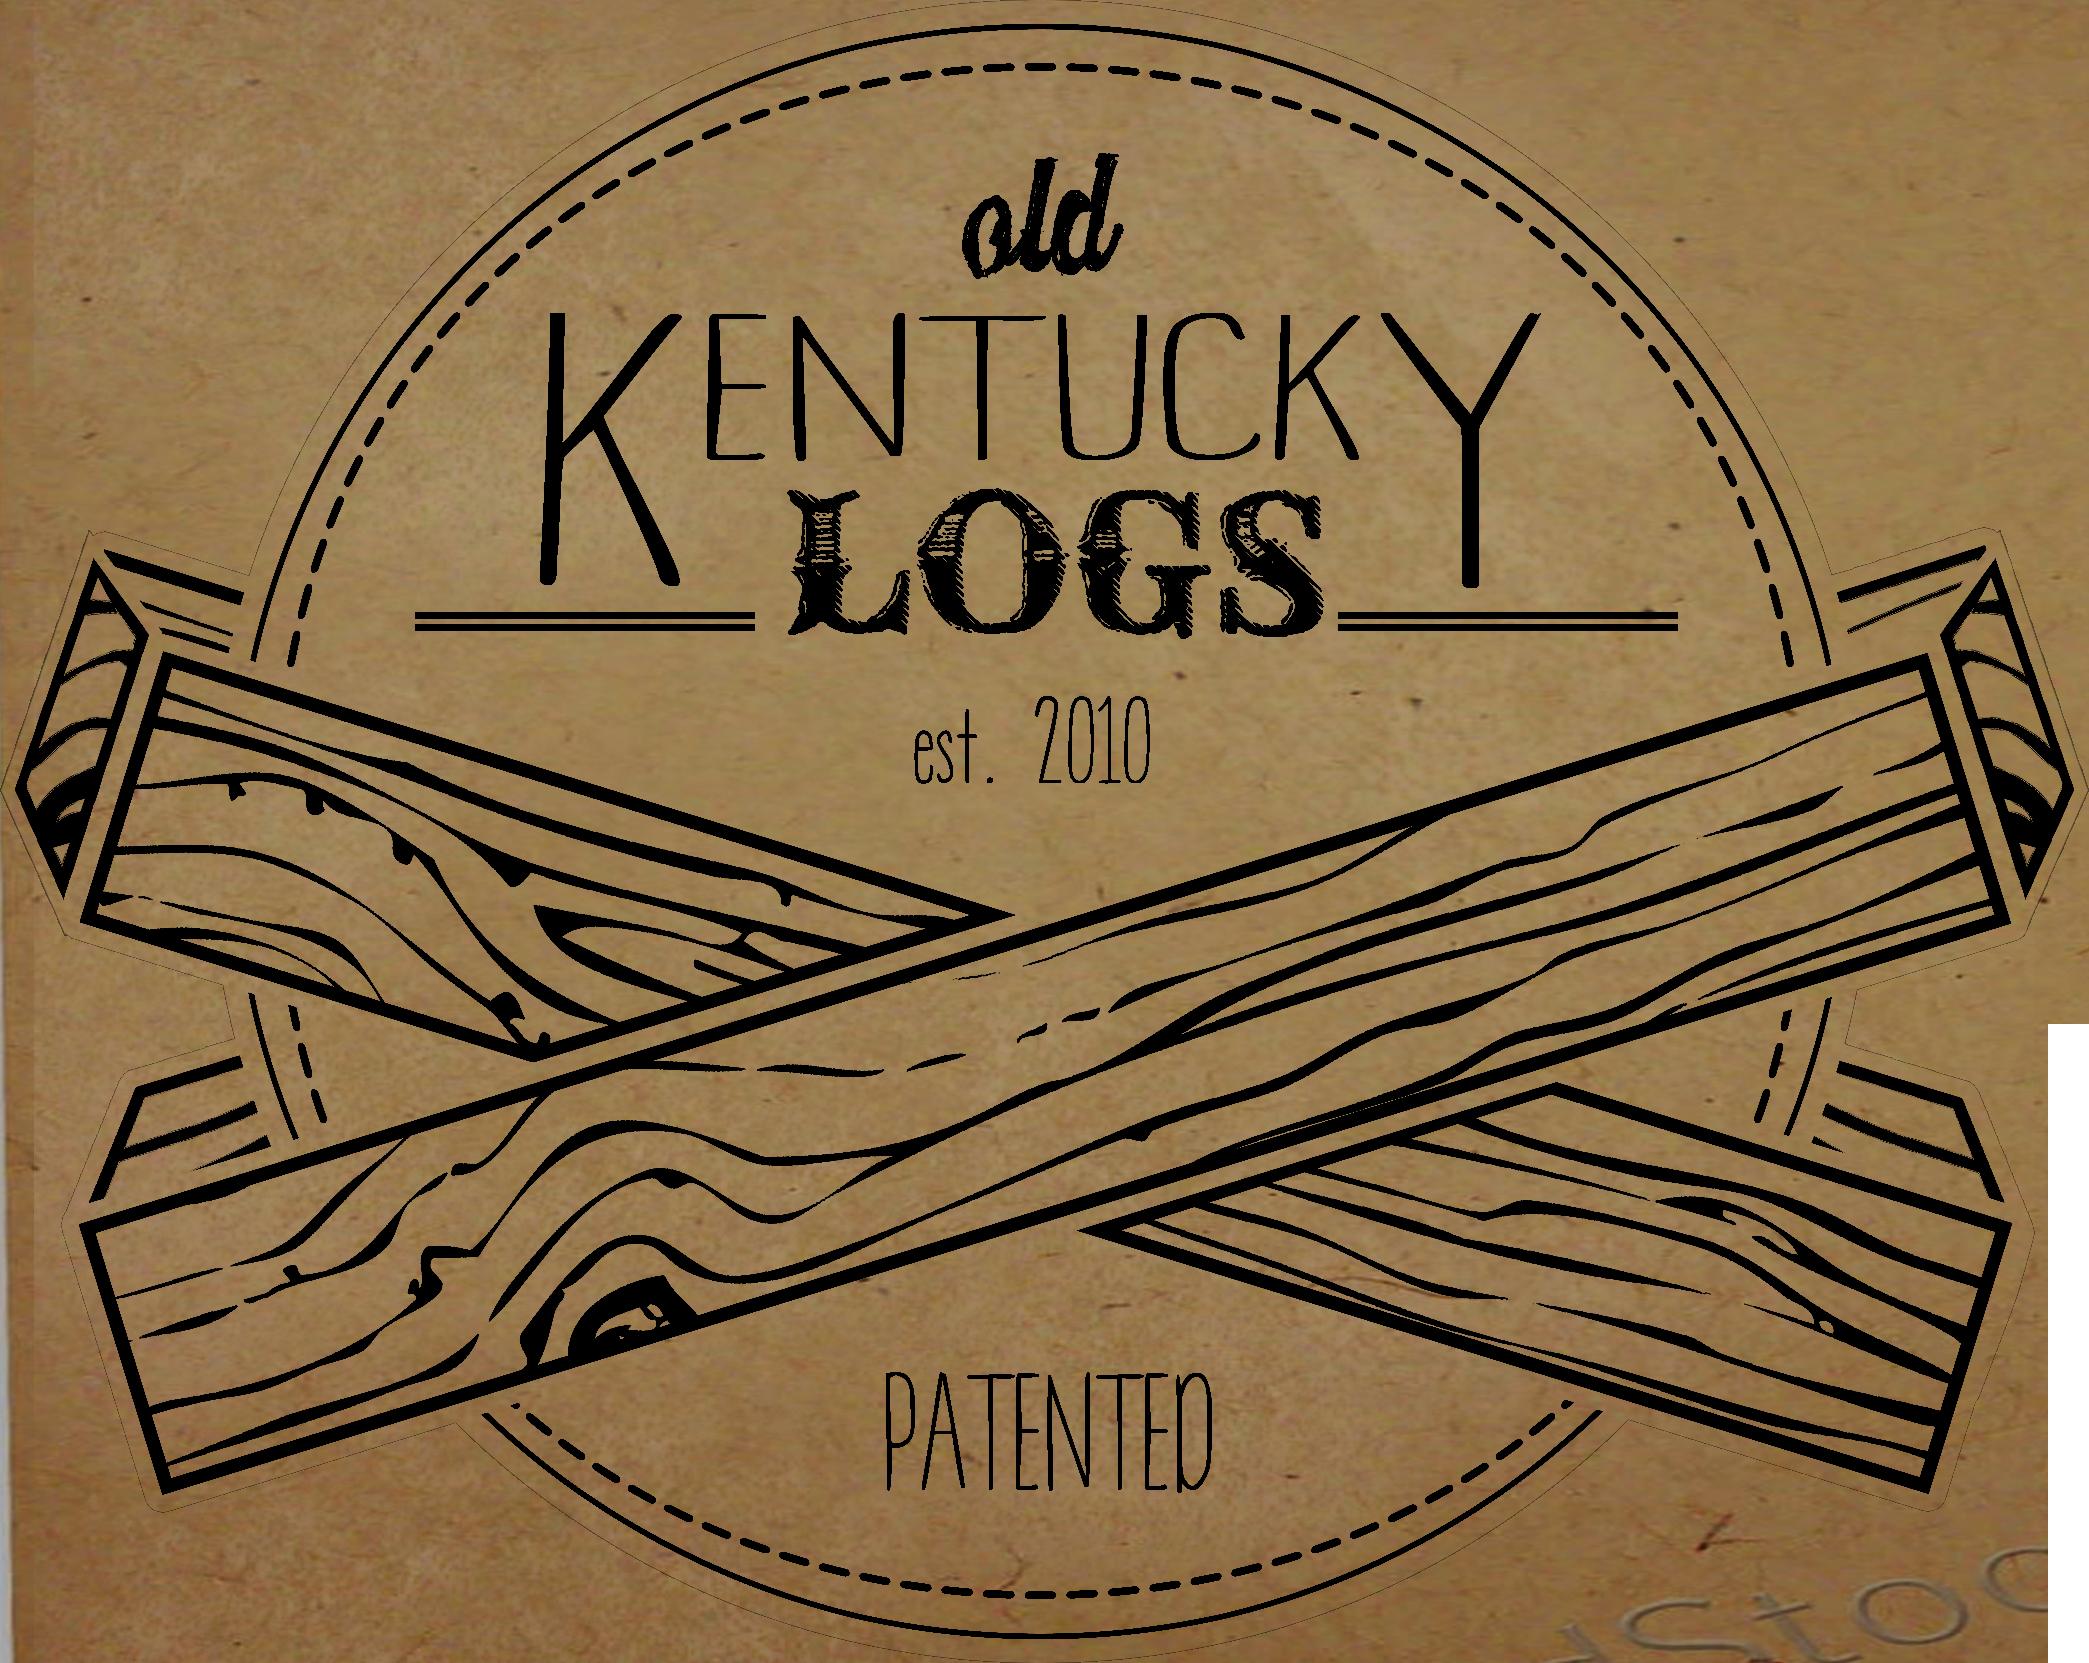 Old Kentucky Logs – Concrete Log Siding